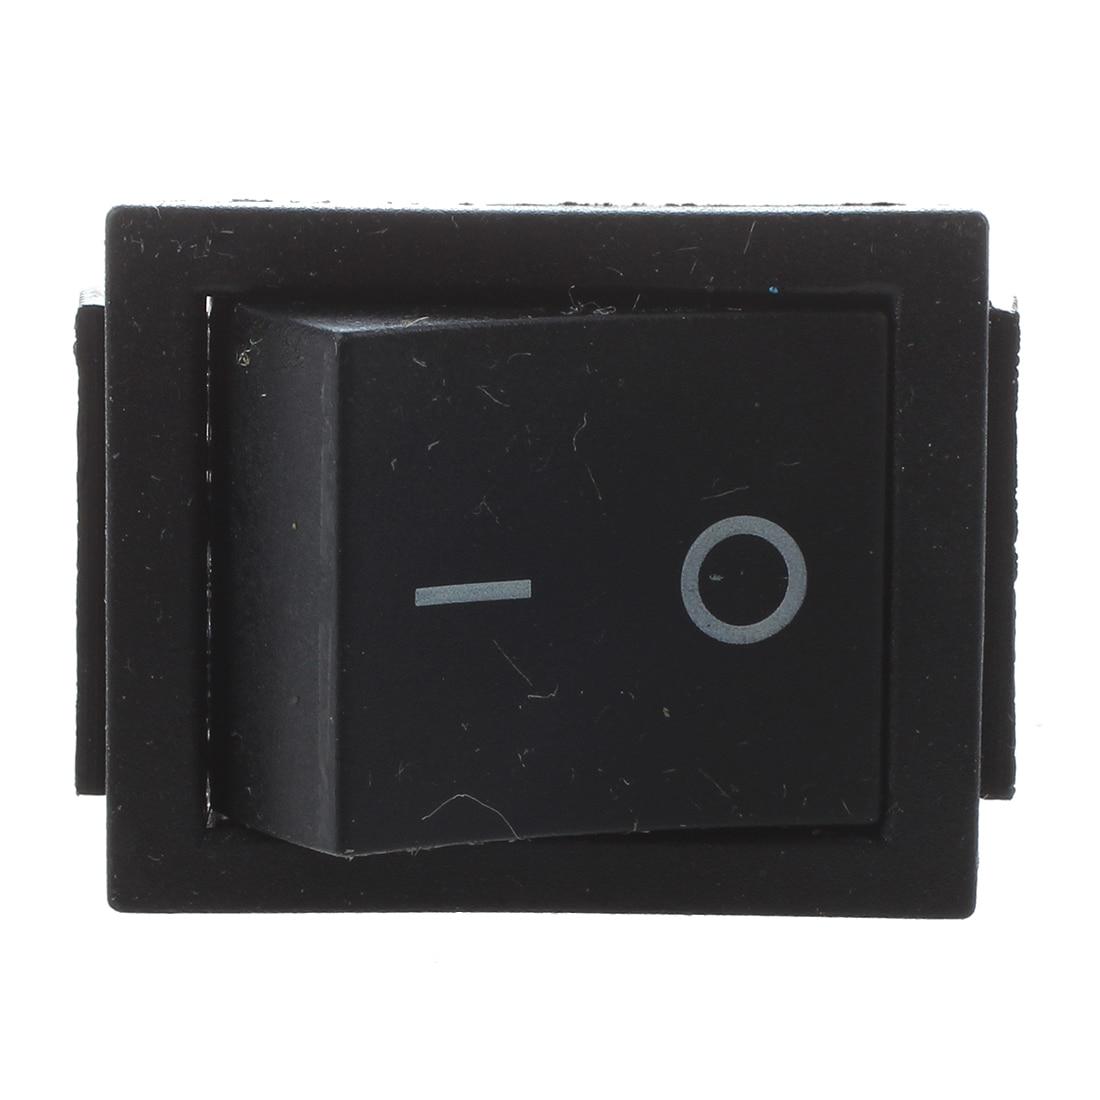 Cheap Price 2 Pcs Black 4 Pins Dpst On/off Rocker Switch Ac 250v/15a 125v/20a Lights & Lighting